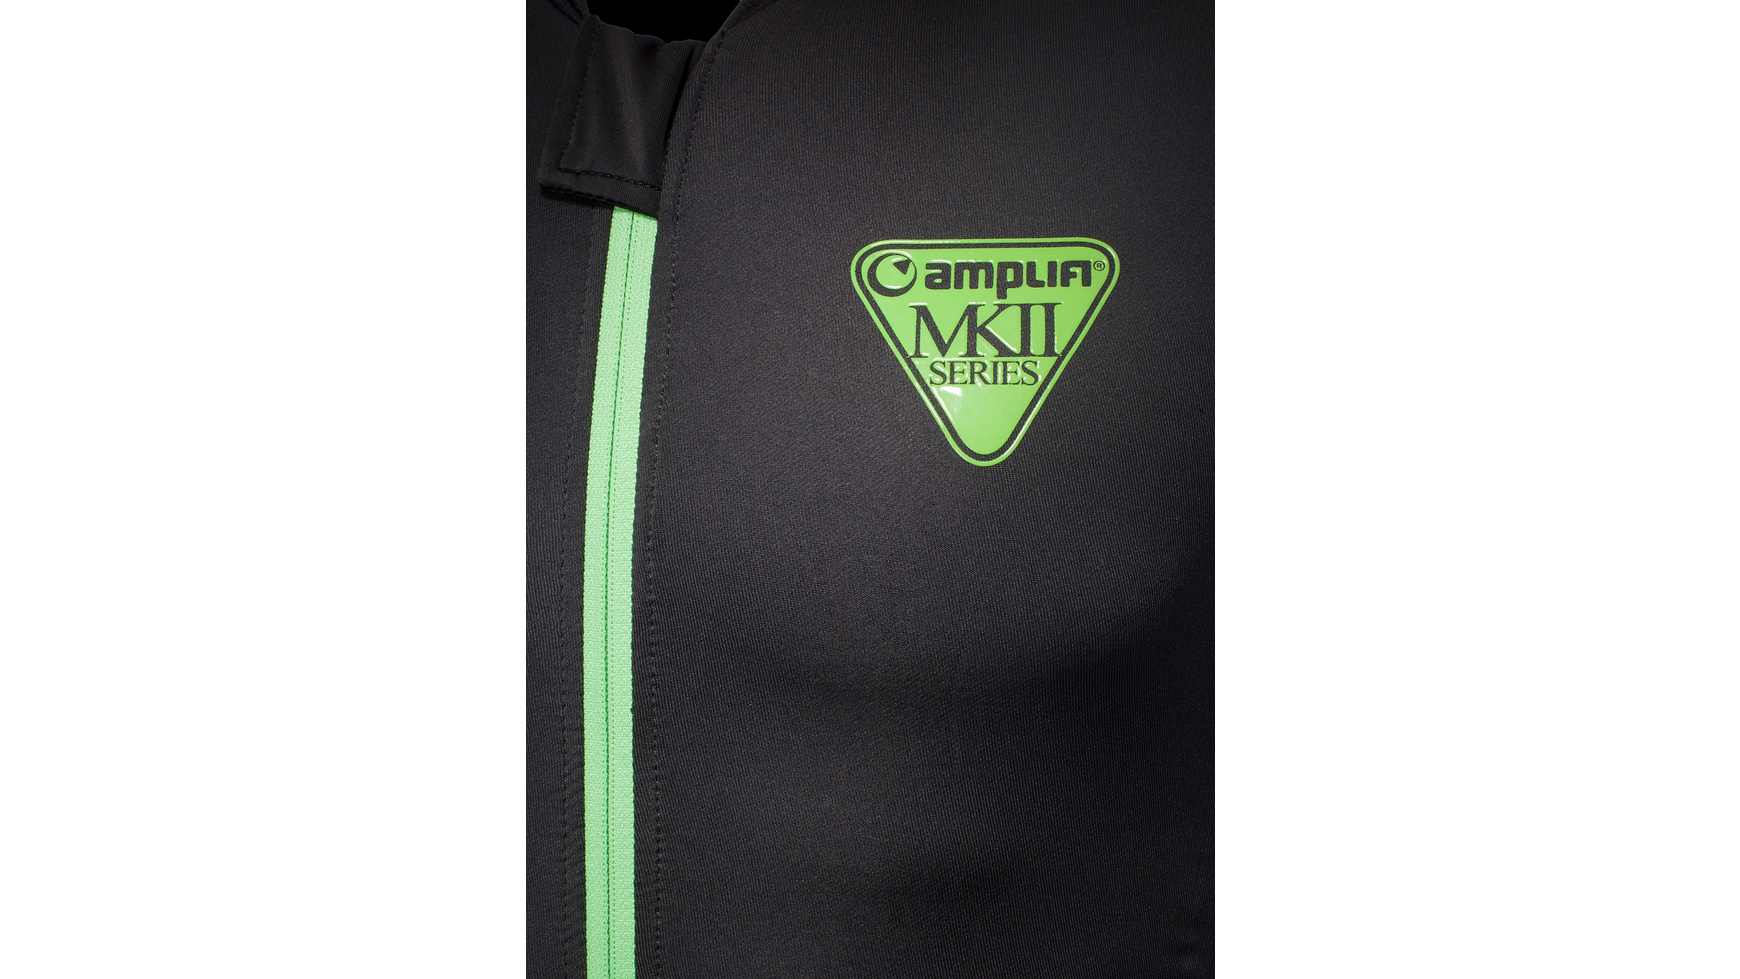 AMPLIFI MK II Rückenprotektor